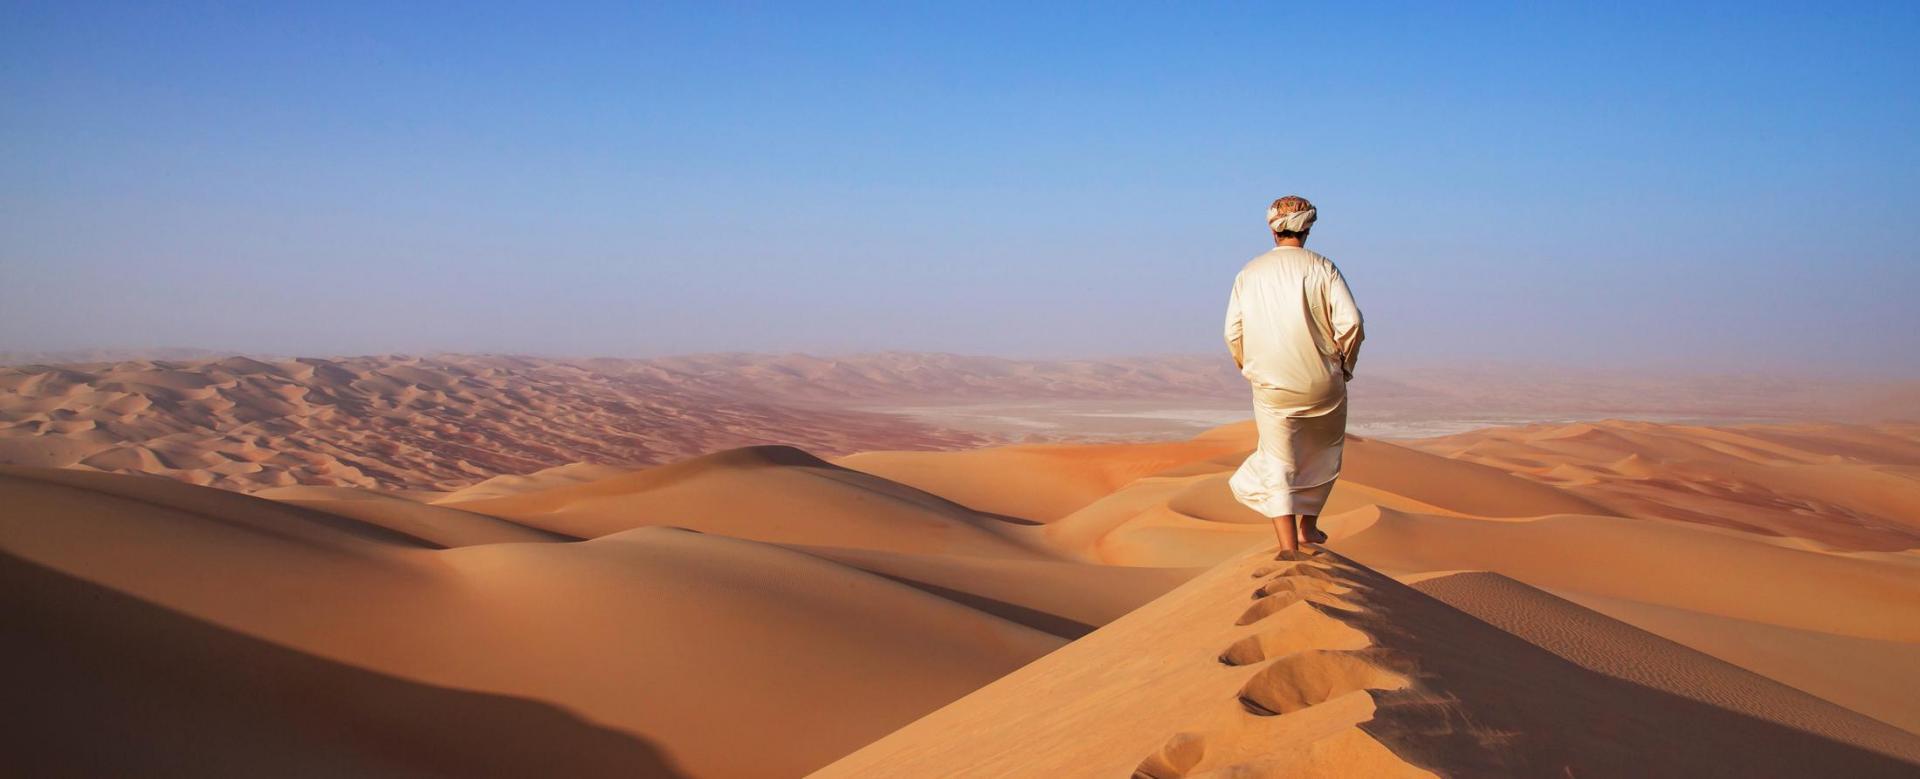 Voyage à pied : Djebel akhdar et océan de sables du rub al khali